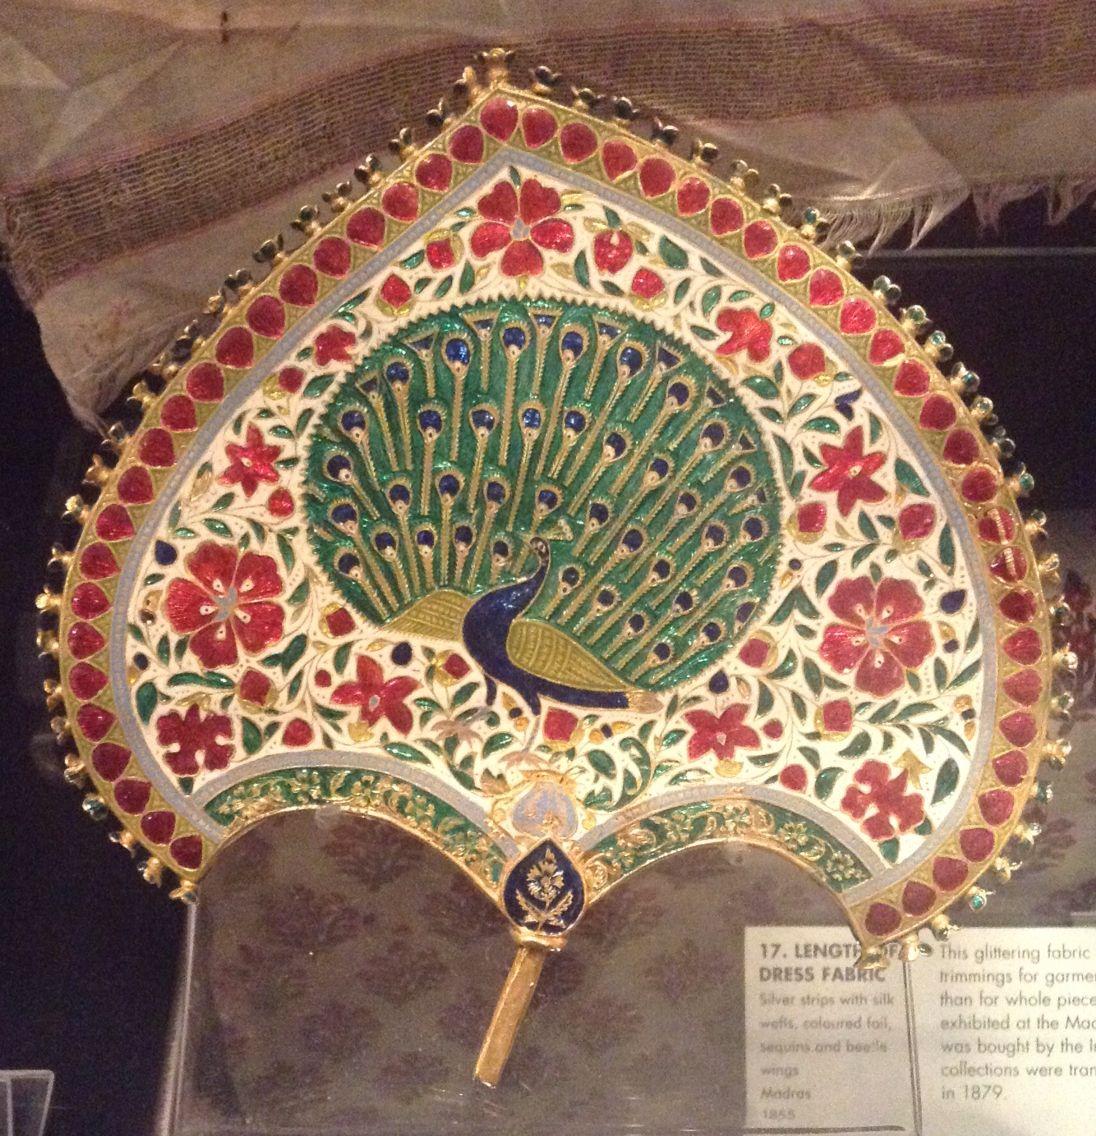 Location Victoria Albert museum London  Turban ornament (jigha)